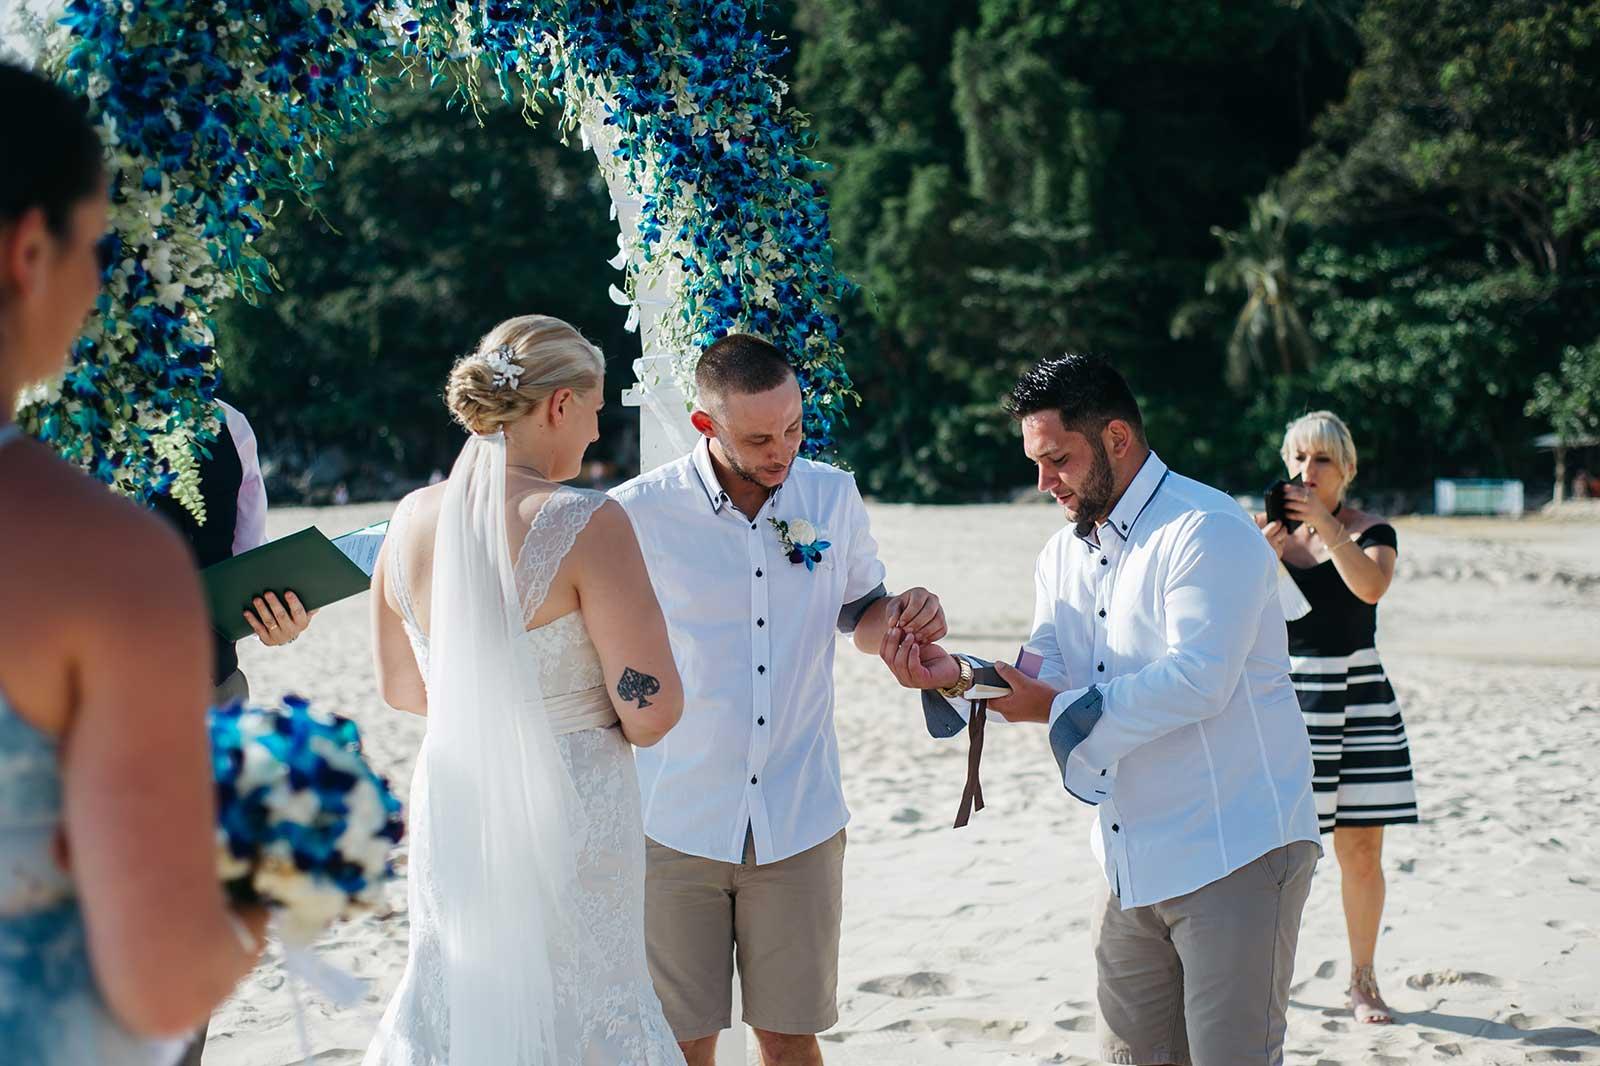 Centara-Grand-Beach-Resort-Kahlia-Luke-Wedding-08